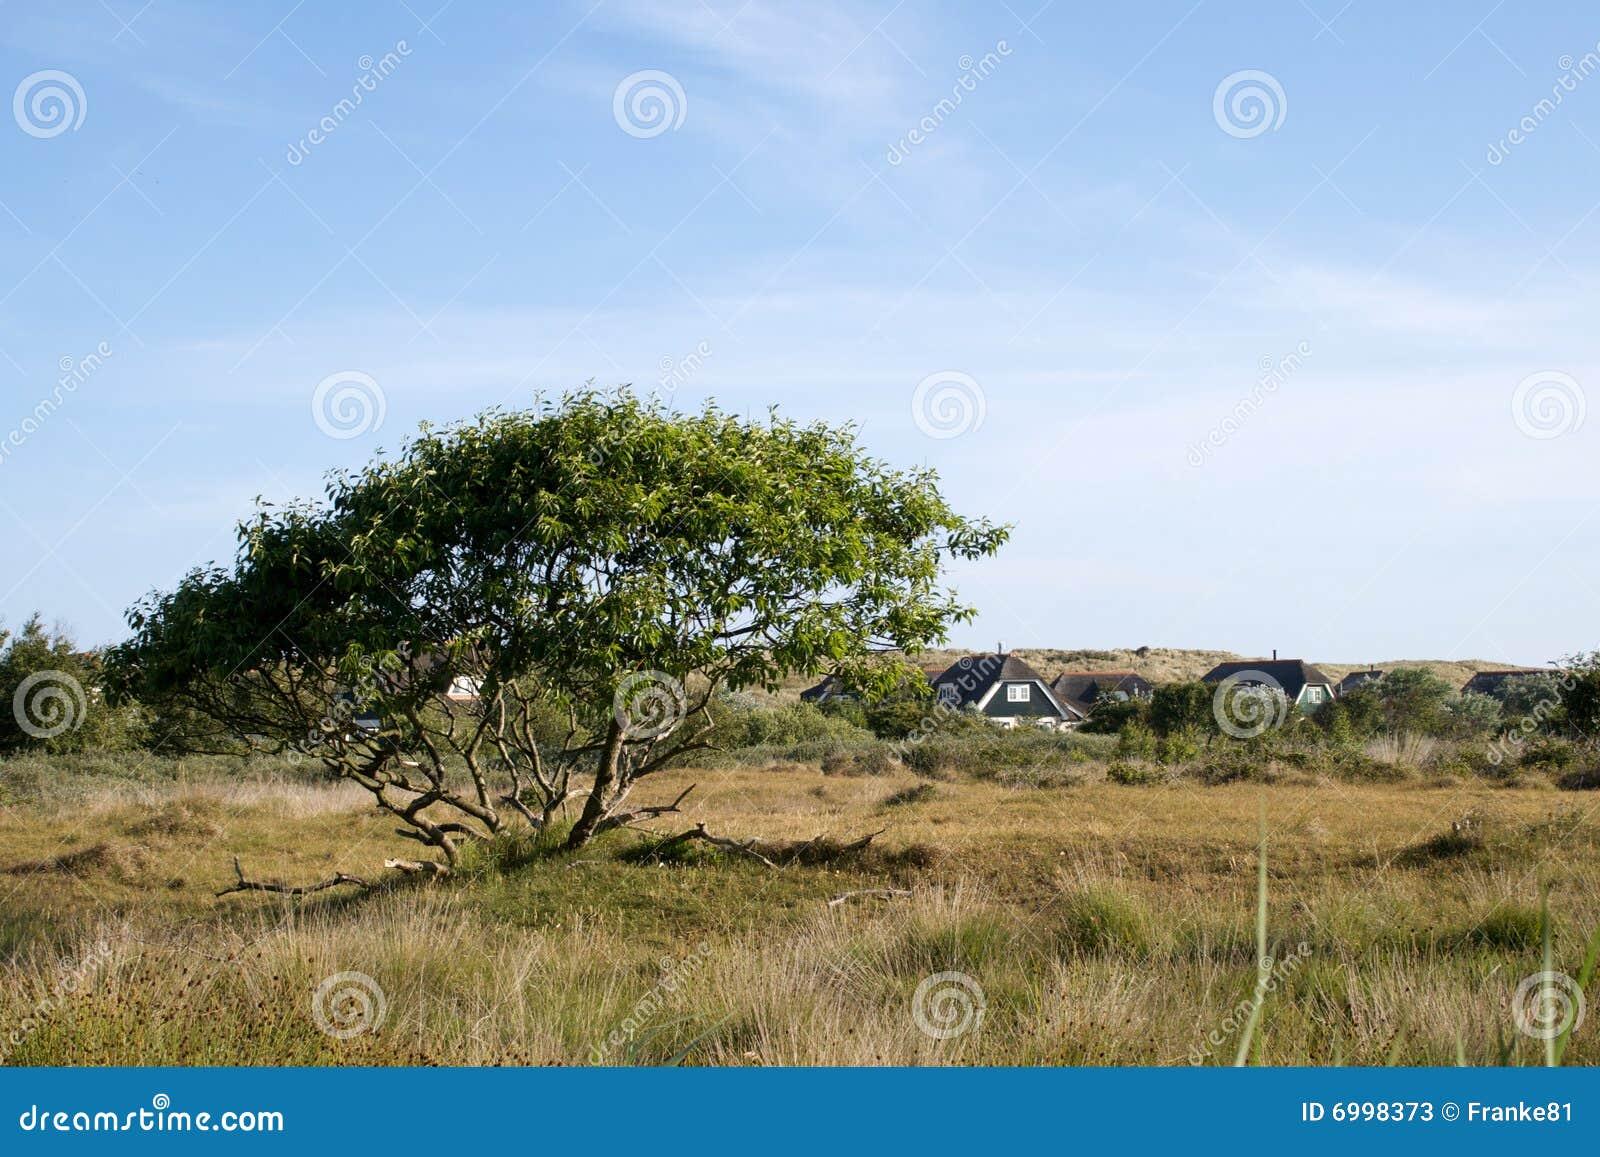 Tree on the grassland